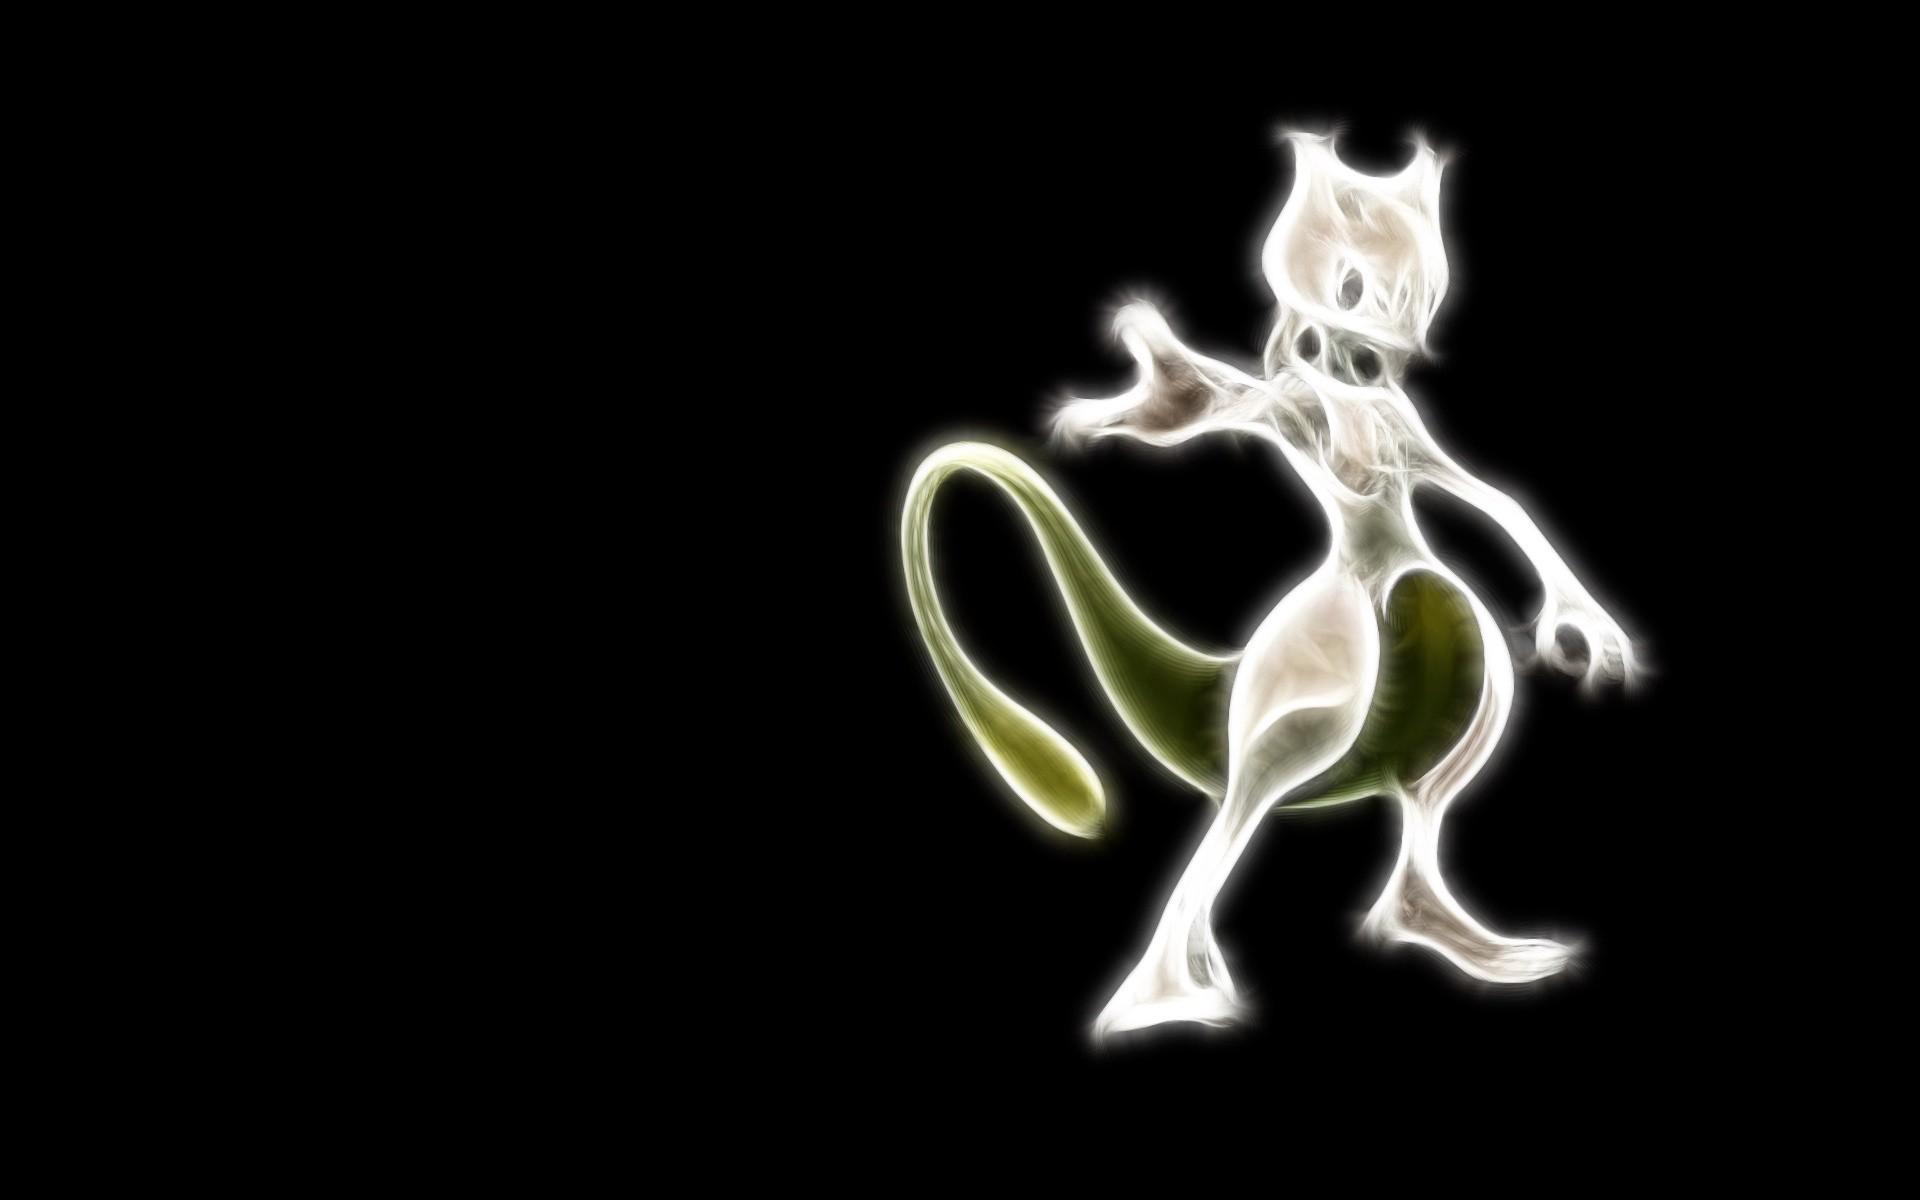 Video Game РPok̩mon Mewtwo (Pok̩mon) Shiny Pok̩mon Wallpaper